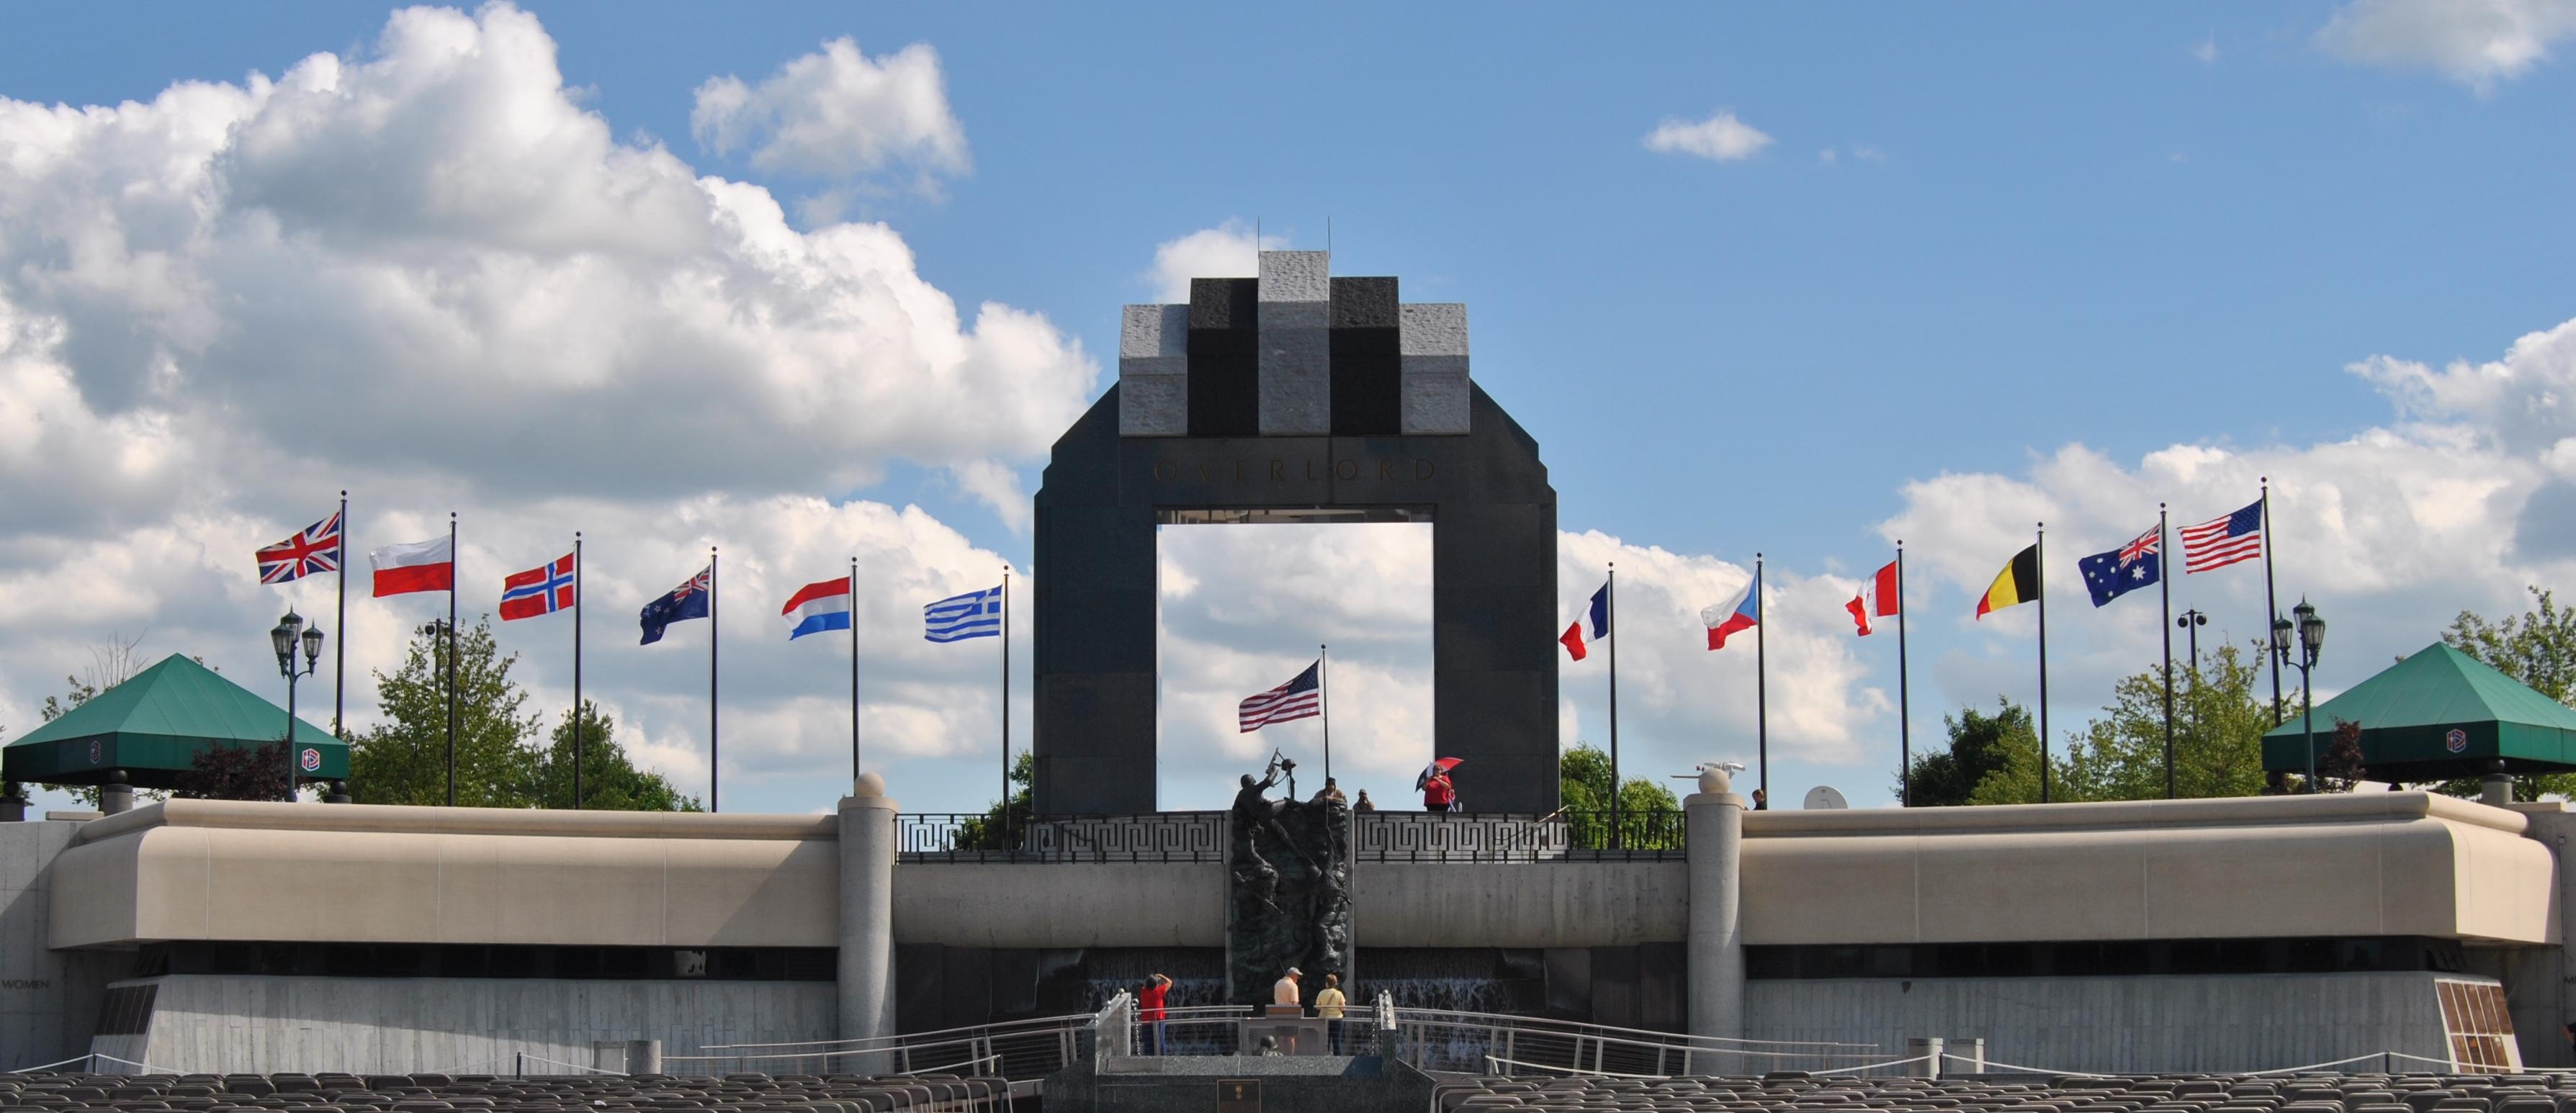 Cover Image Credit Www Veteransofthebattleofthebulge Org Wp Content Uploads 2014 09 Memorial Jpg